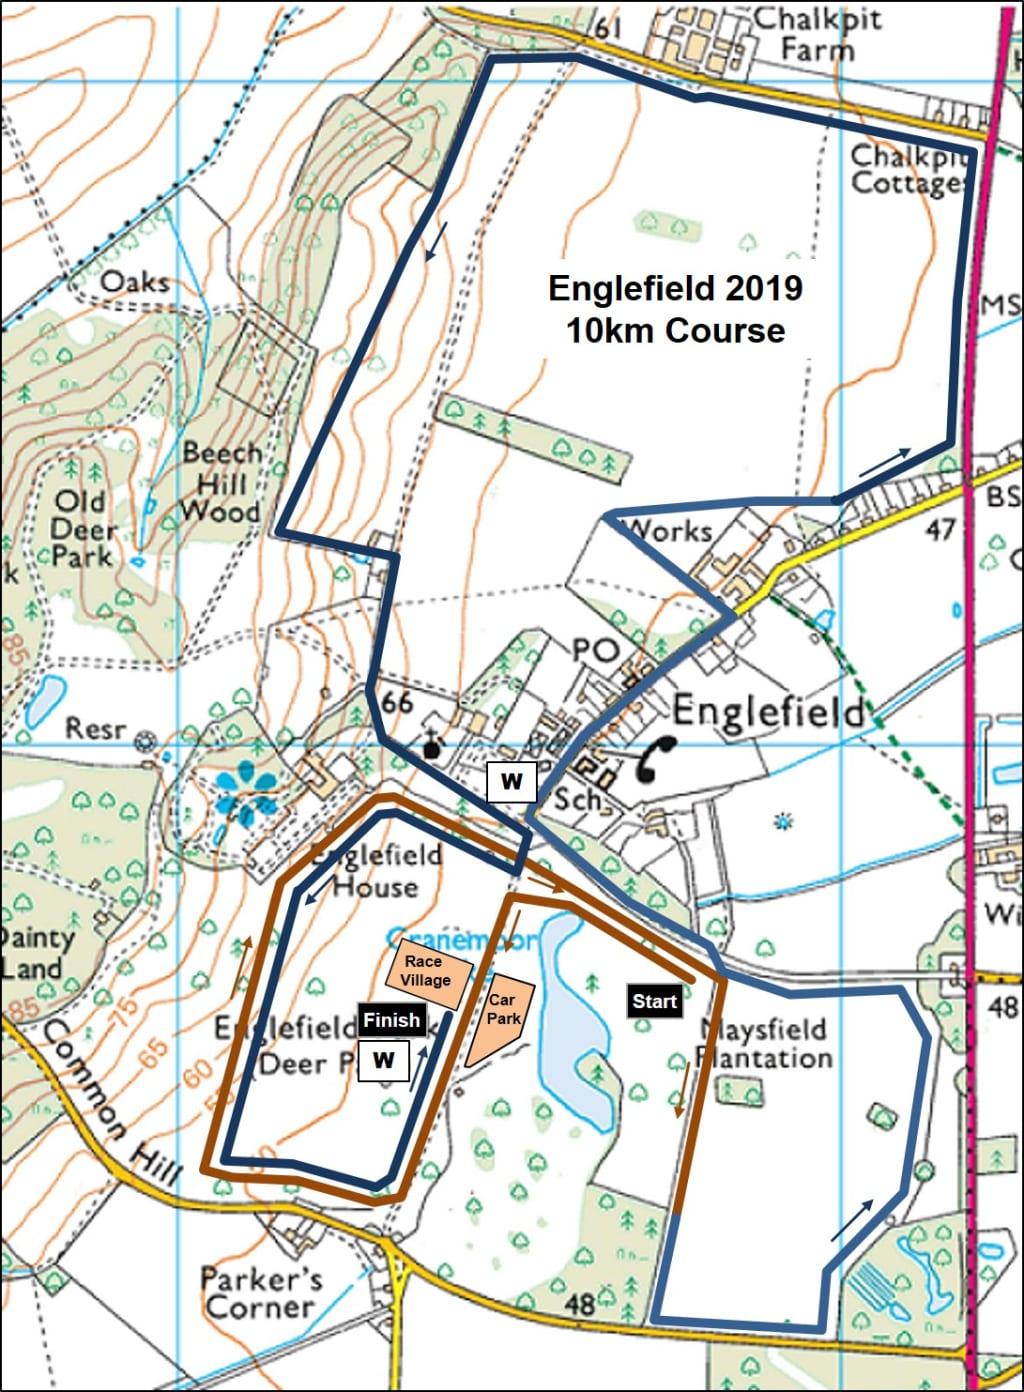 1552898369319ER10k course map 2019.jpg